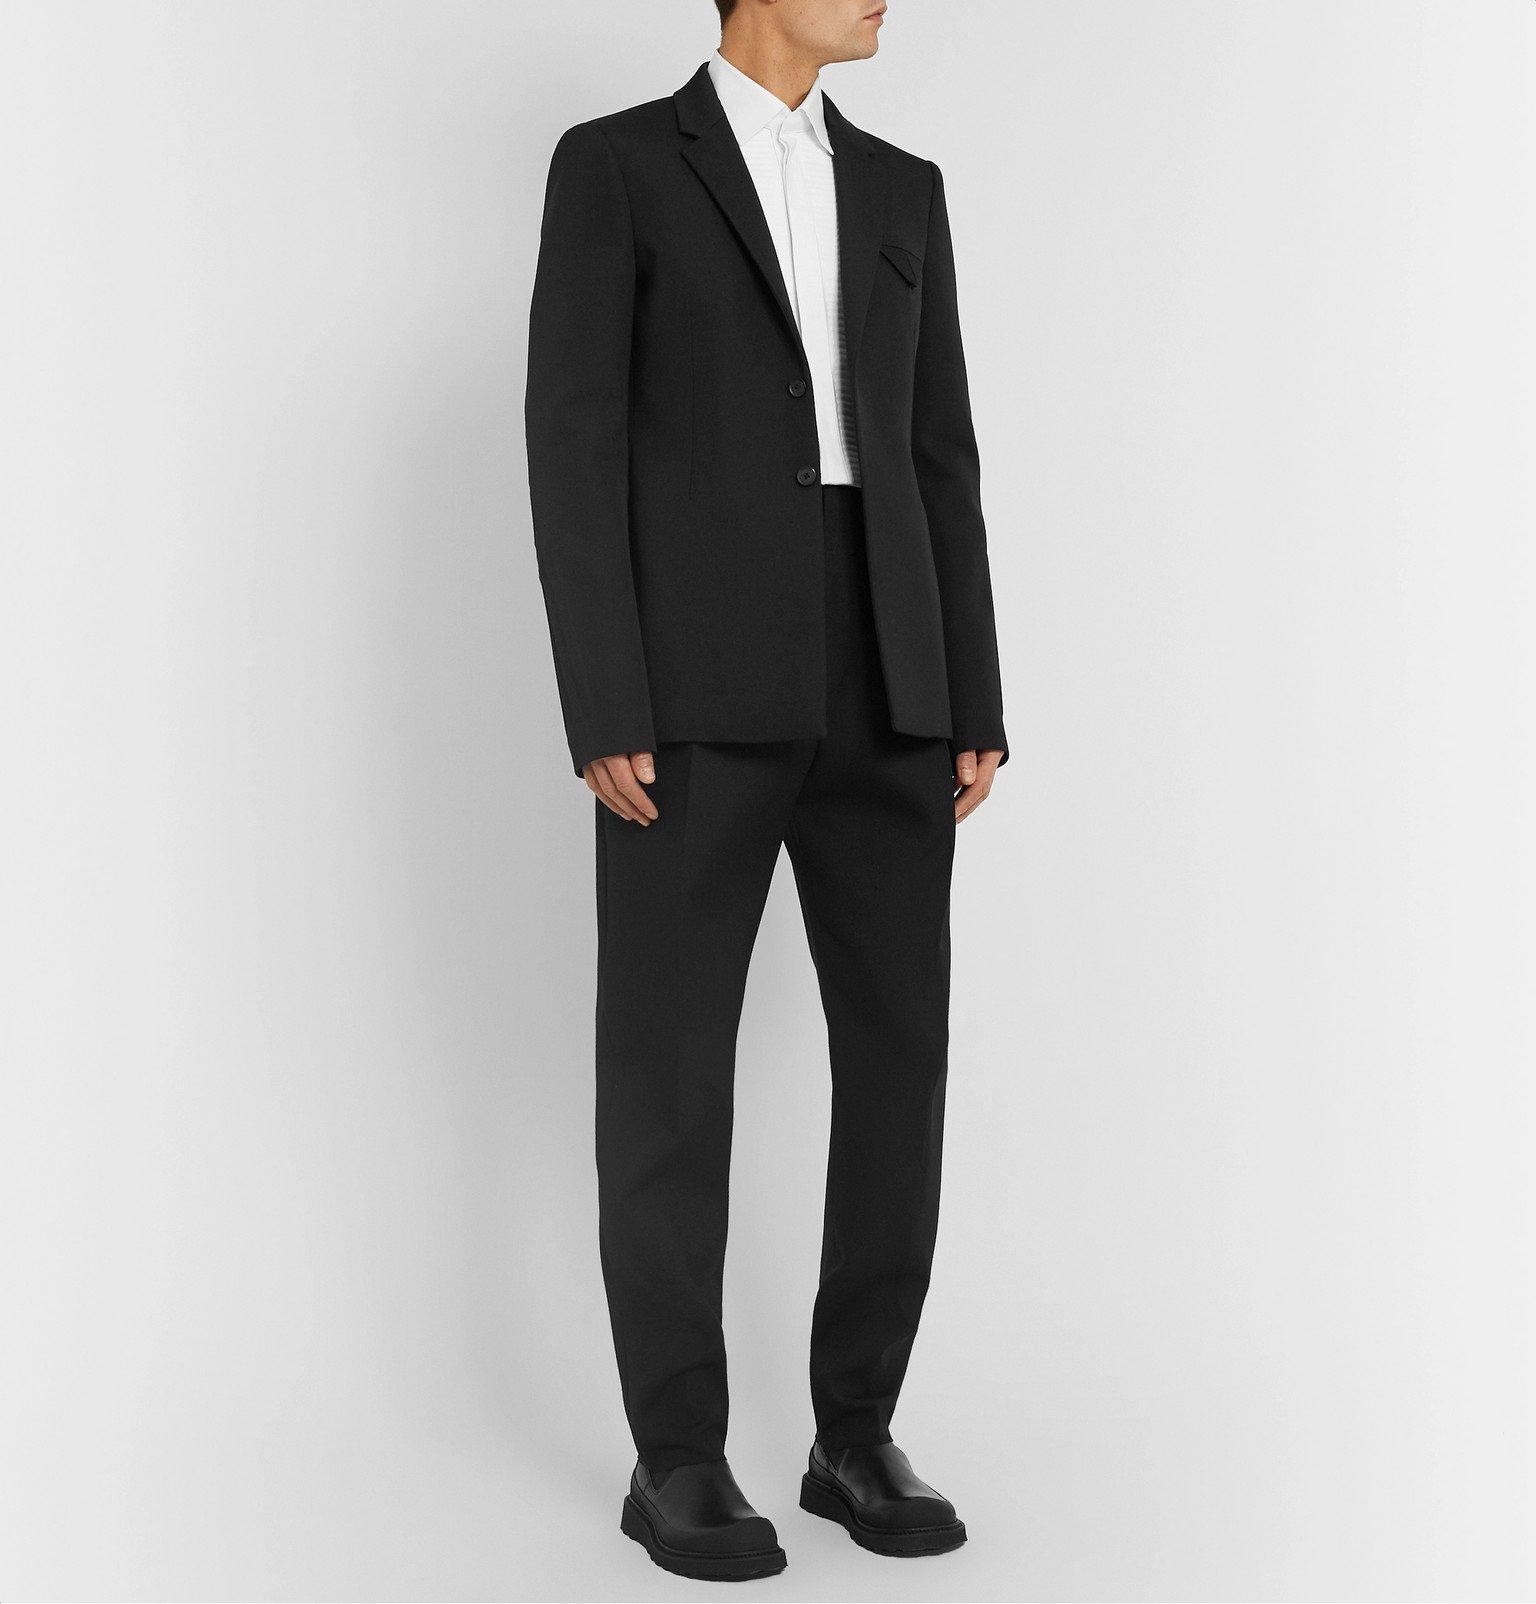 Bottega Veneta - Black Wool Blazer - Black